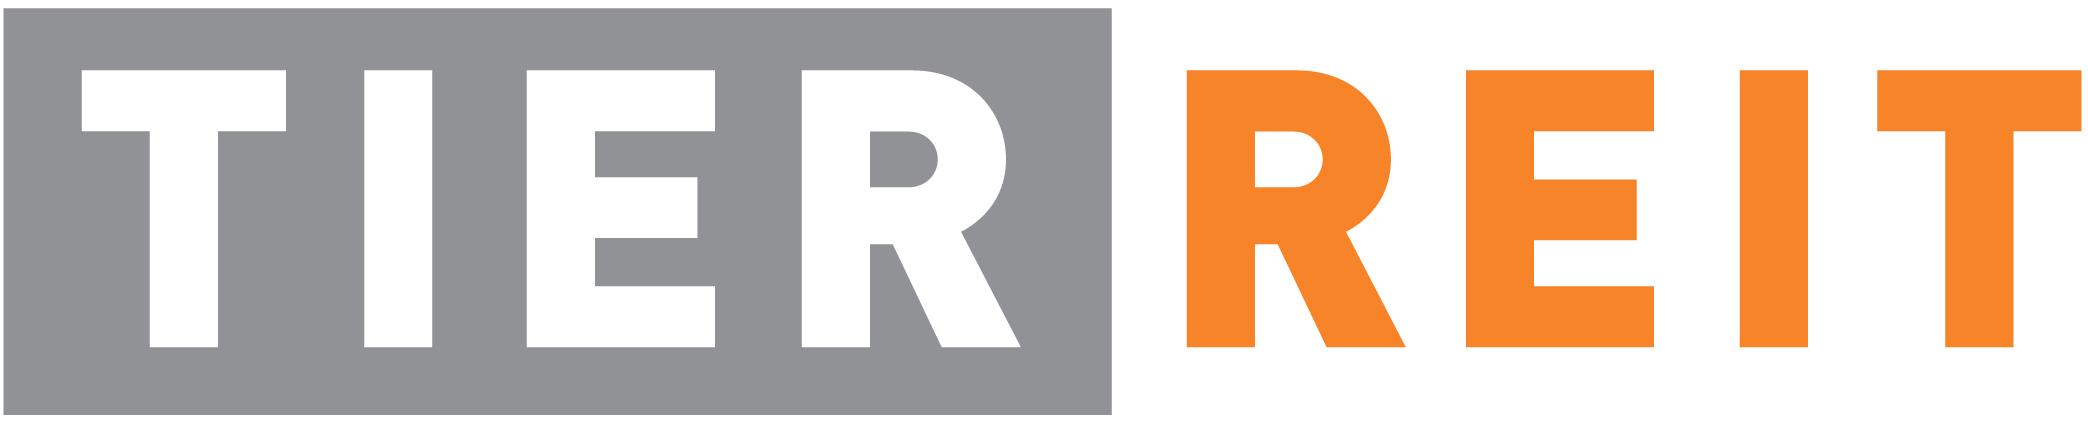 TIER_RGB__FullColor (1).jpg